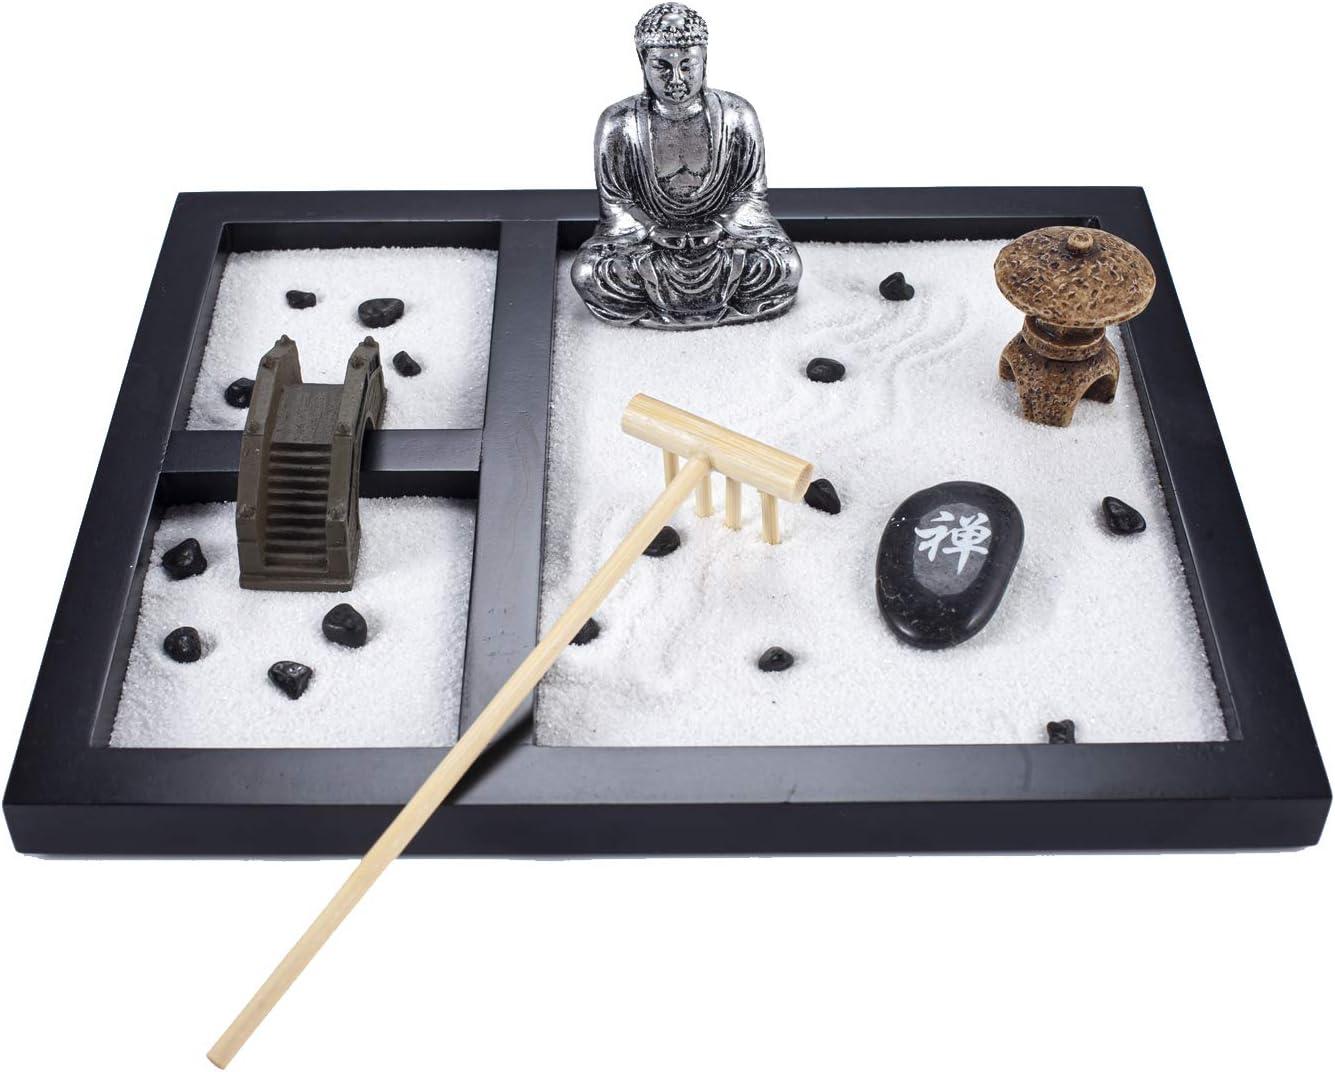 YJ Buddha Statue Meditation Zen Garden Table Décor Kit with Accessories GR019